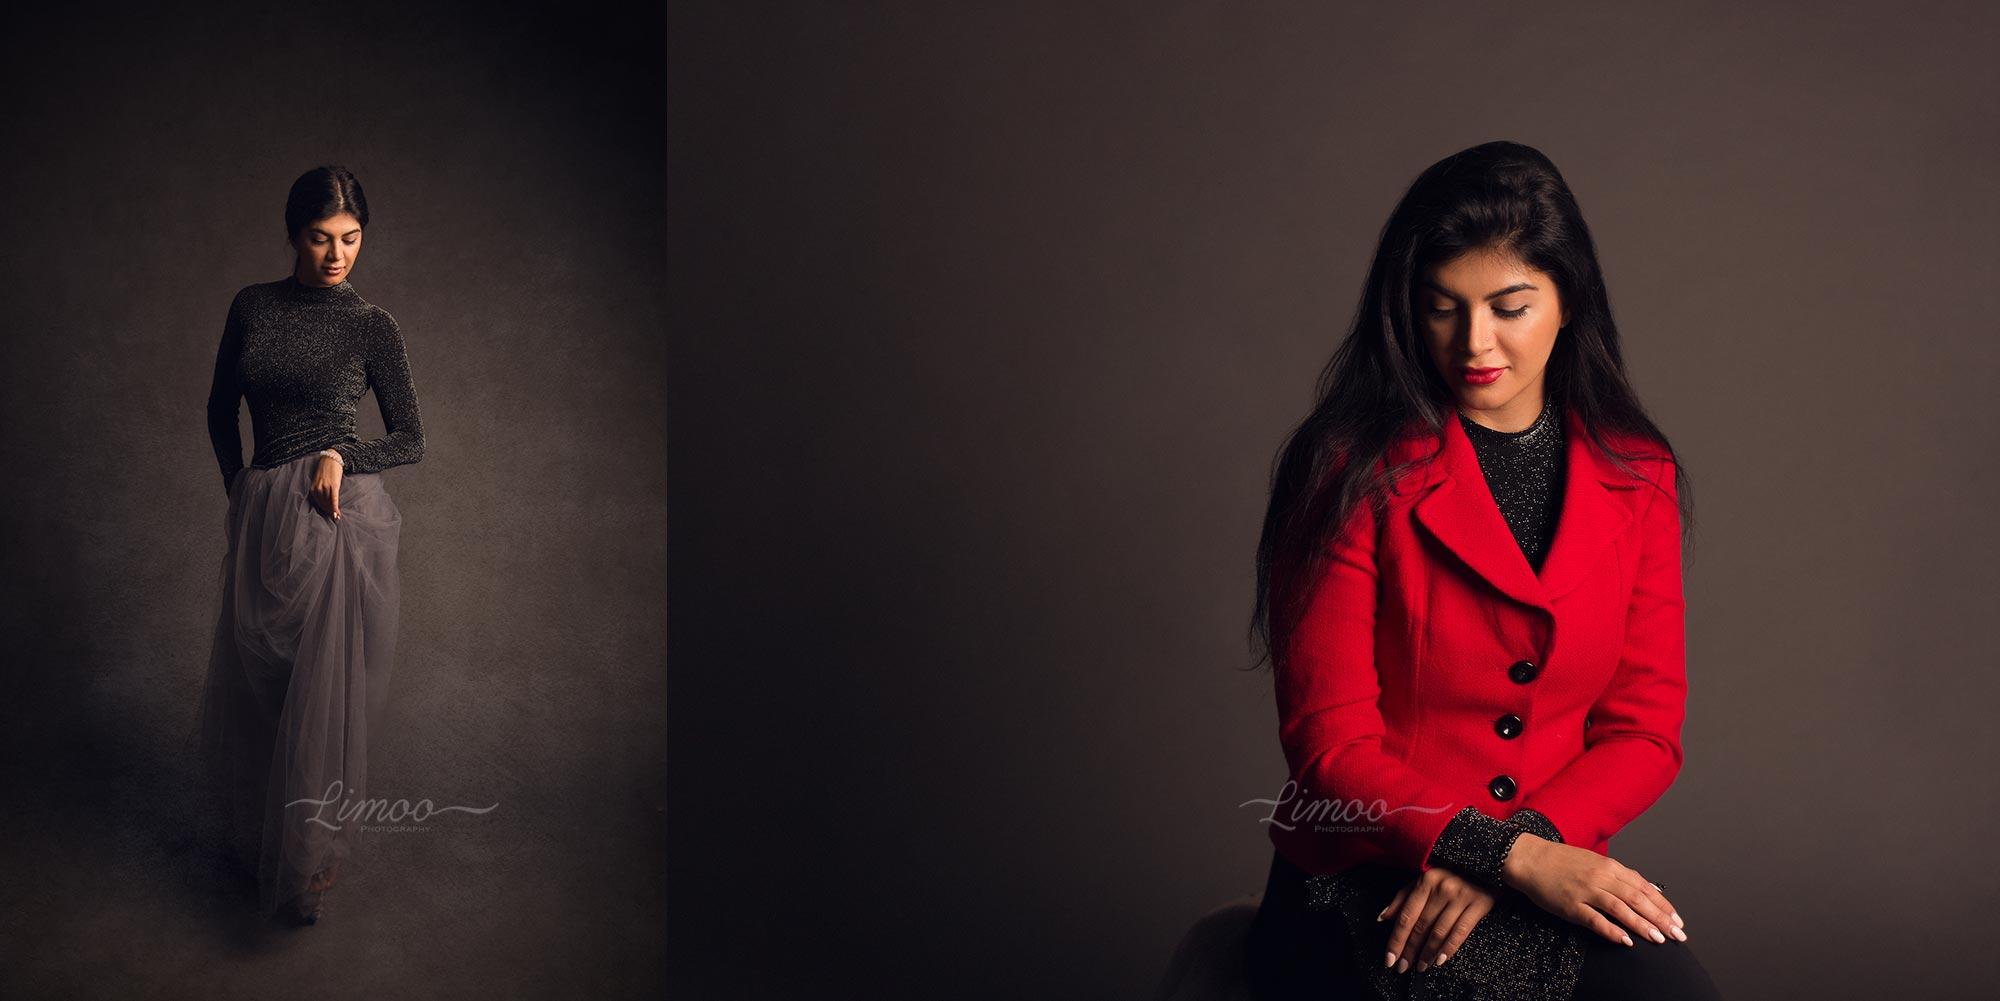 LimooPhotography-Portraitor-3